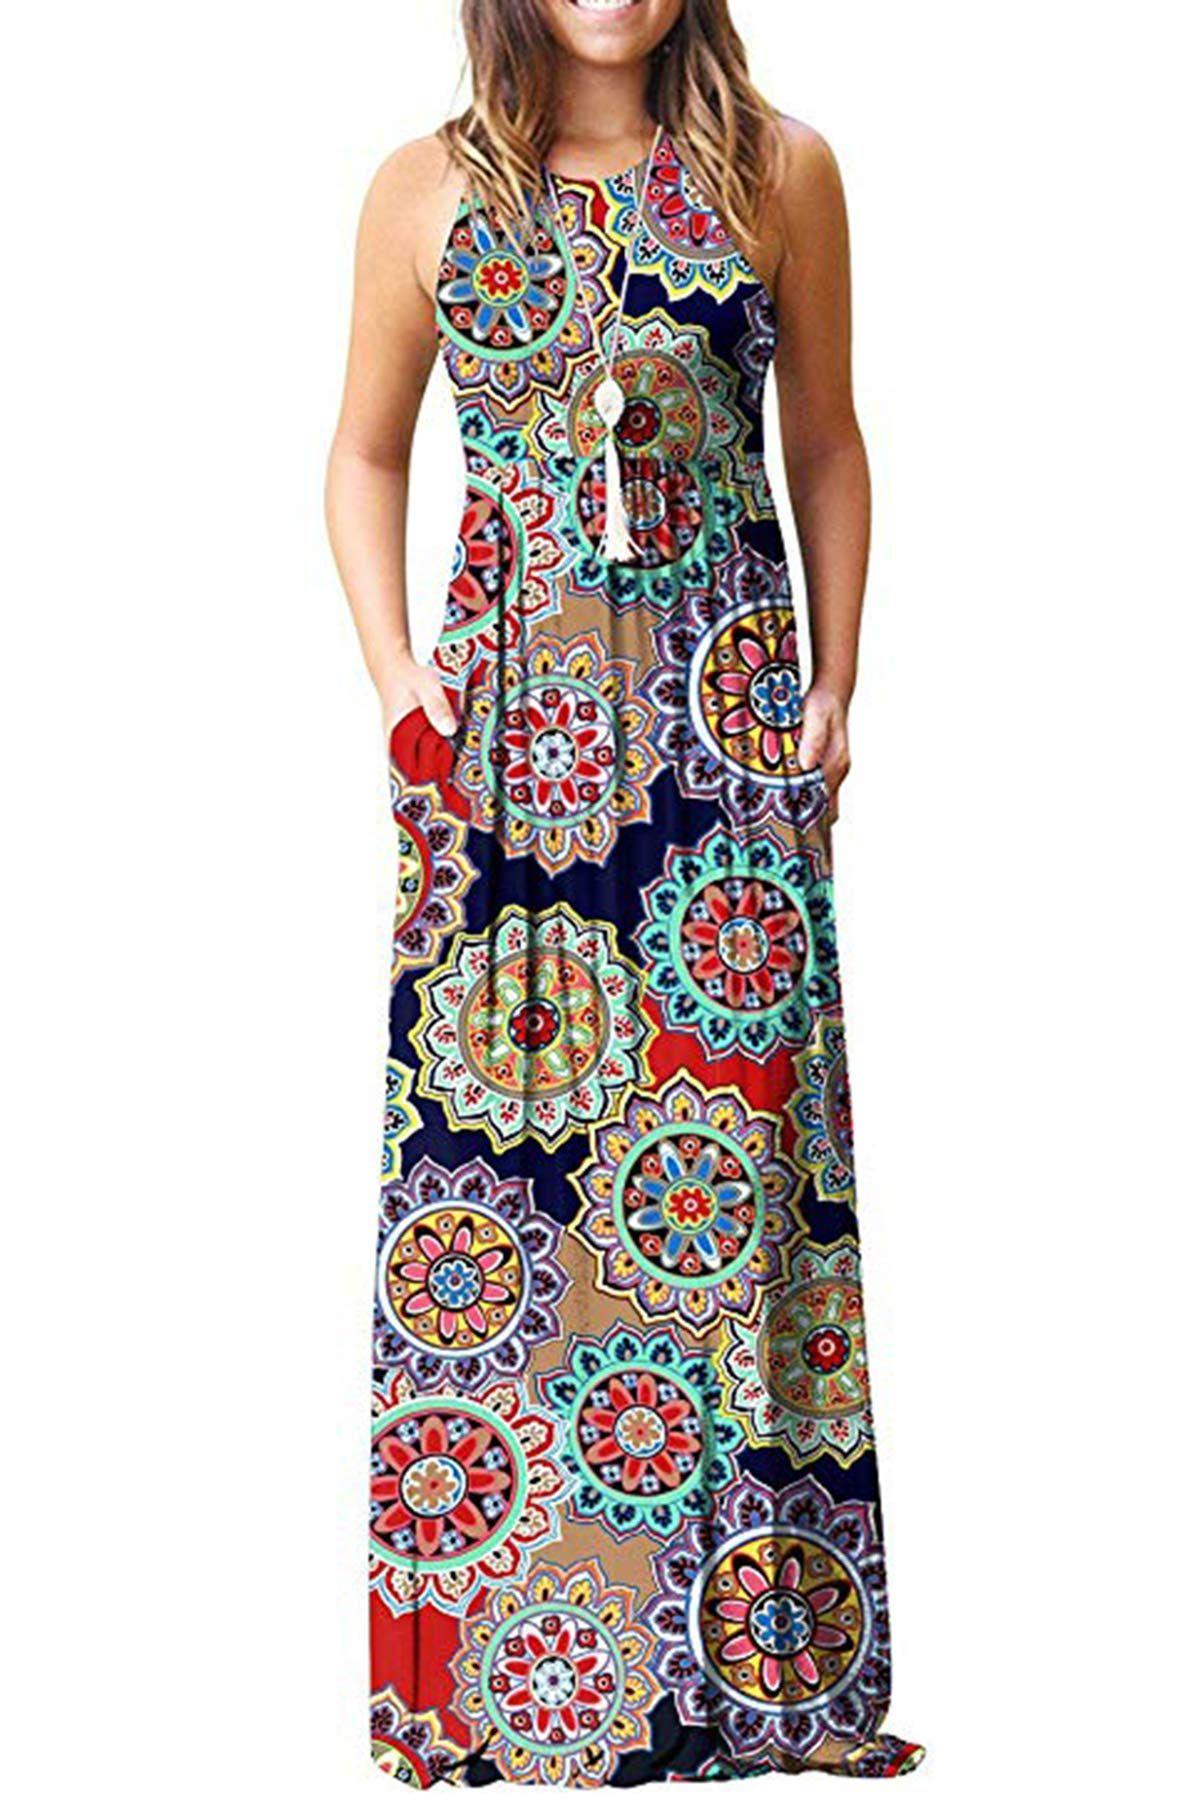 Dolpind Womens Sleeveless Dresses Pockets Maxi Dress Long Dress Casual Casual Dresses [ 1800 x 1200 Pixel ]